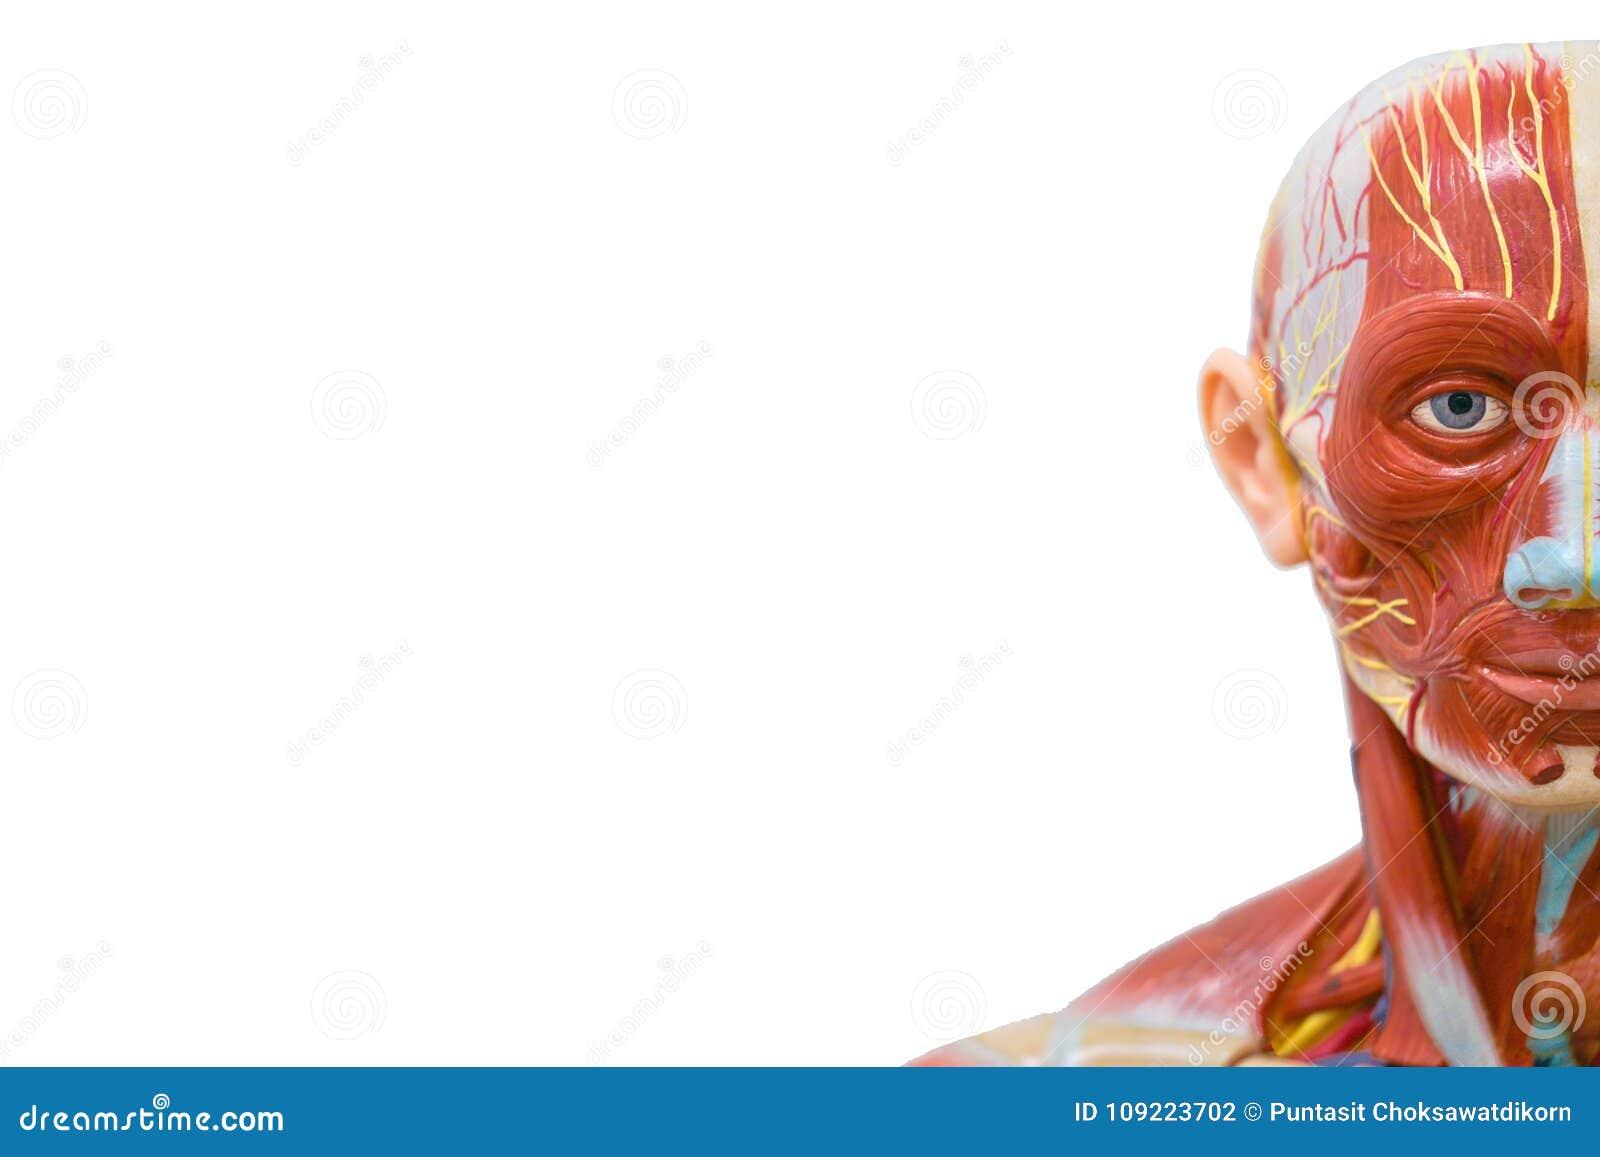 Science Background : Human Head Anatomy Model Stock Photo - Image of ...